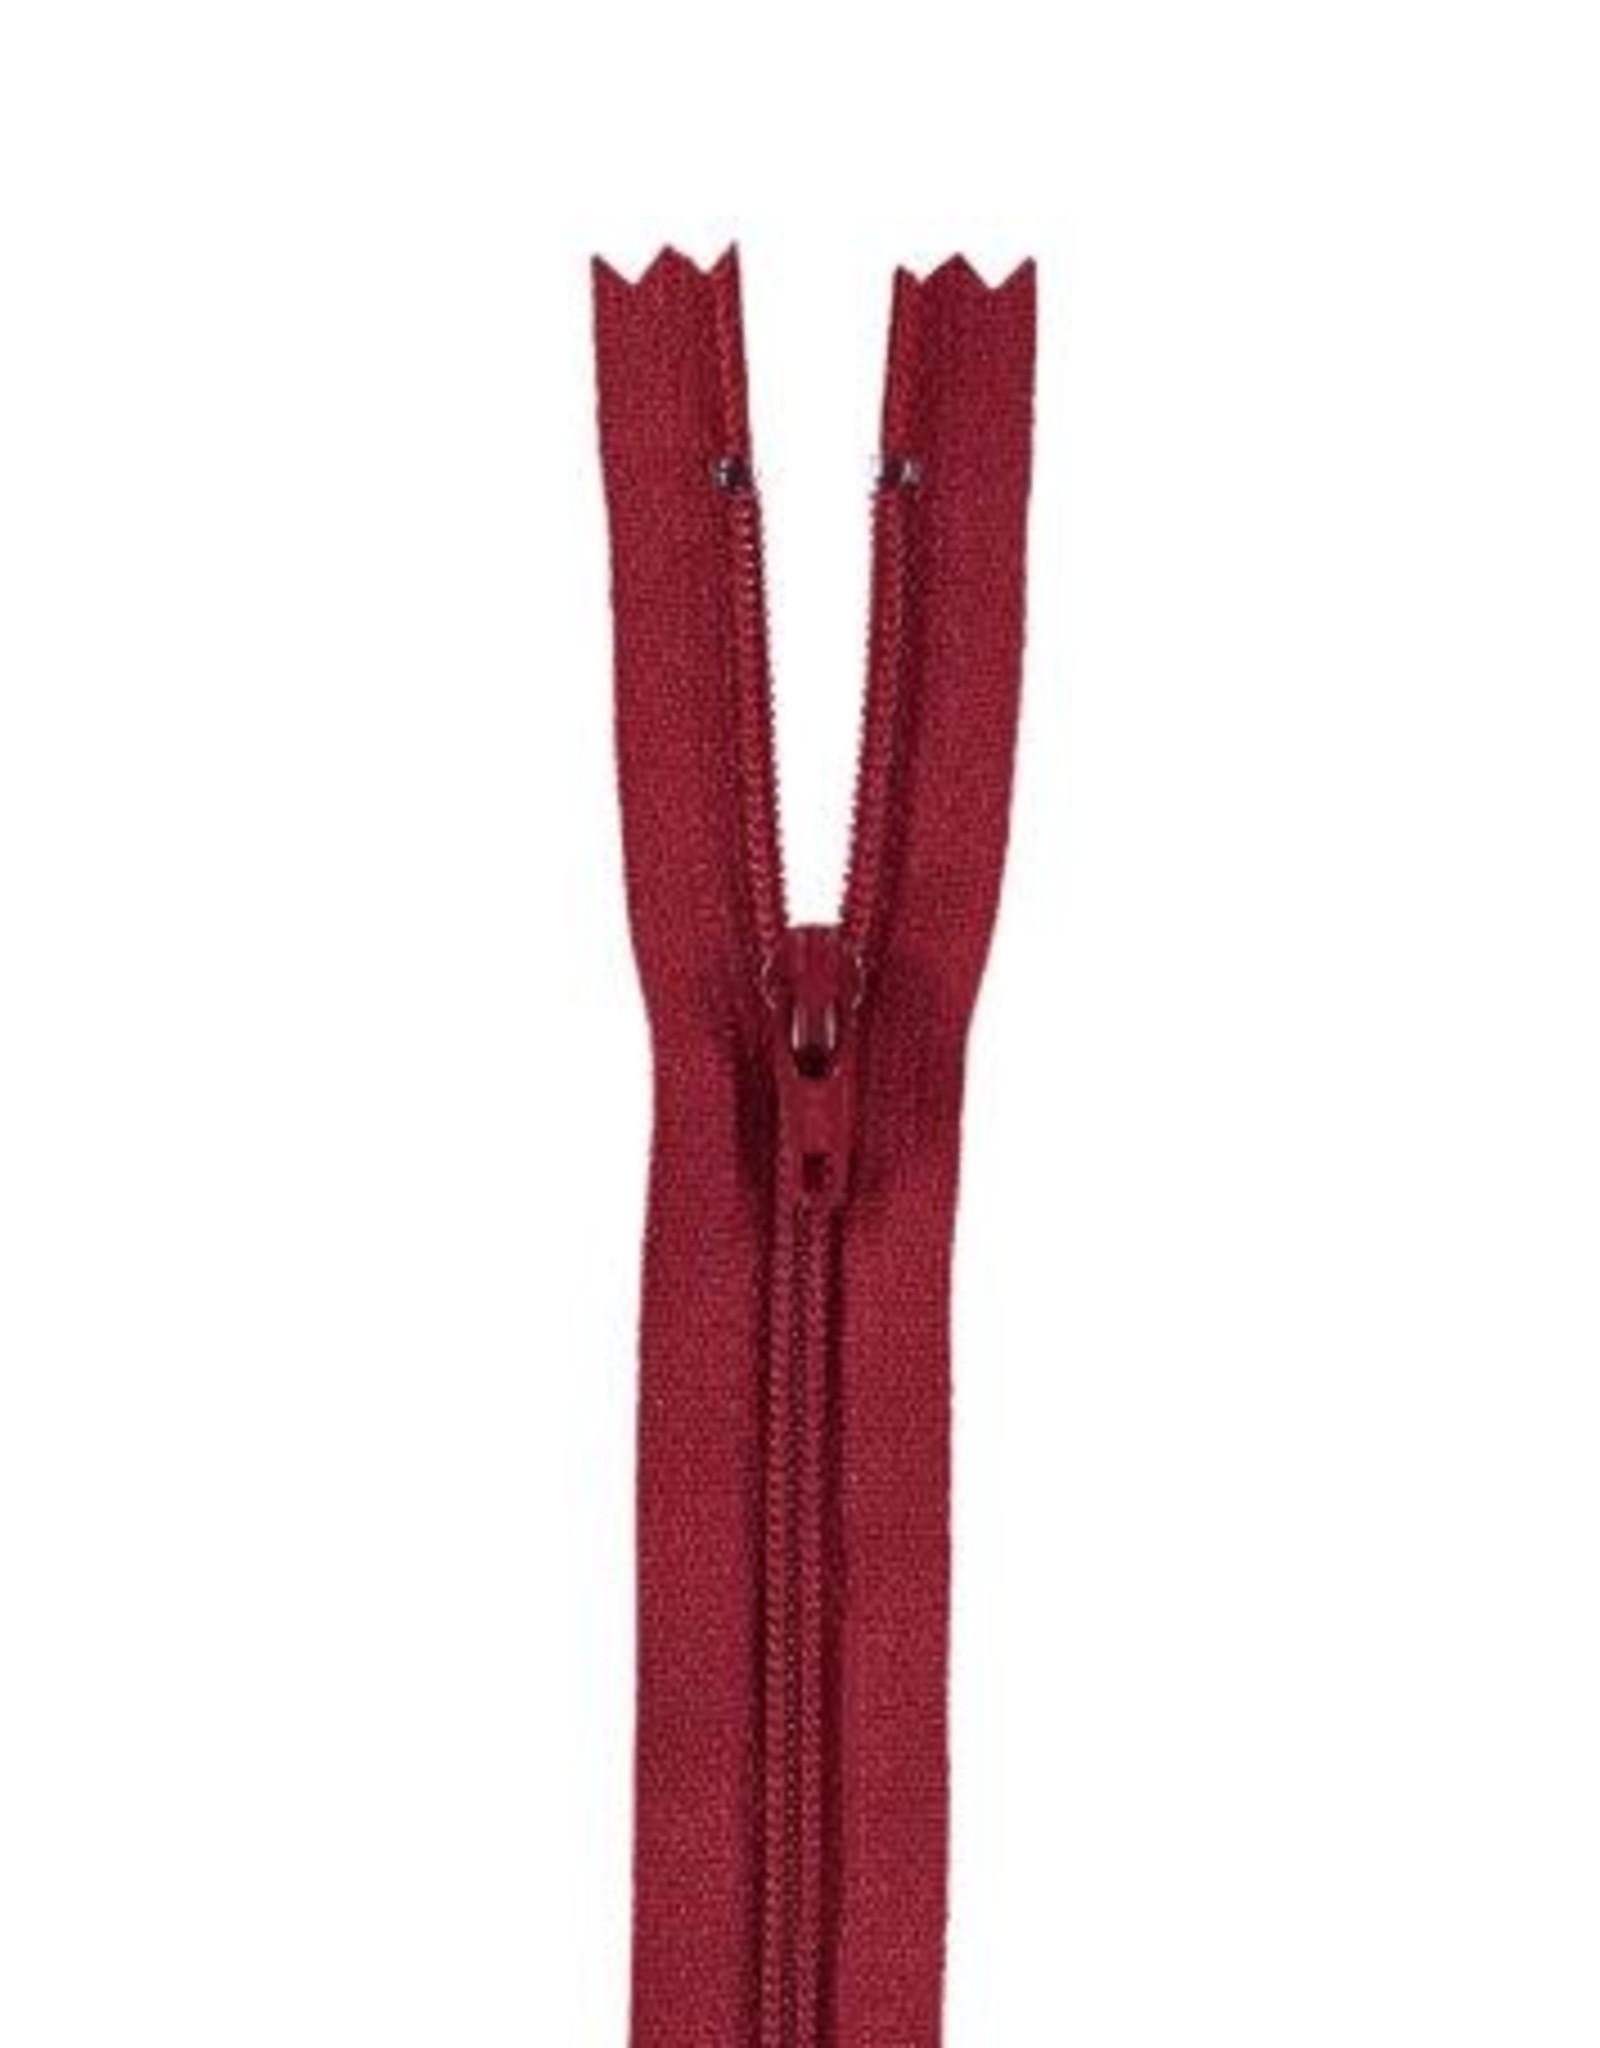 YKK Spiraalrits niet-DB 3mm donker rood 520-40cm